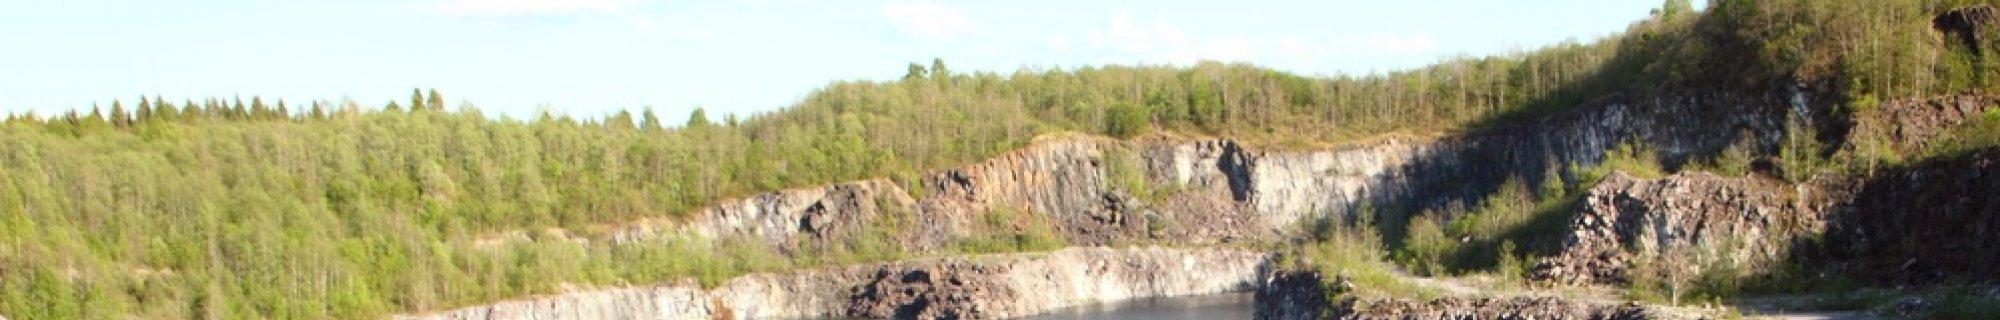 Quarry photograph